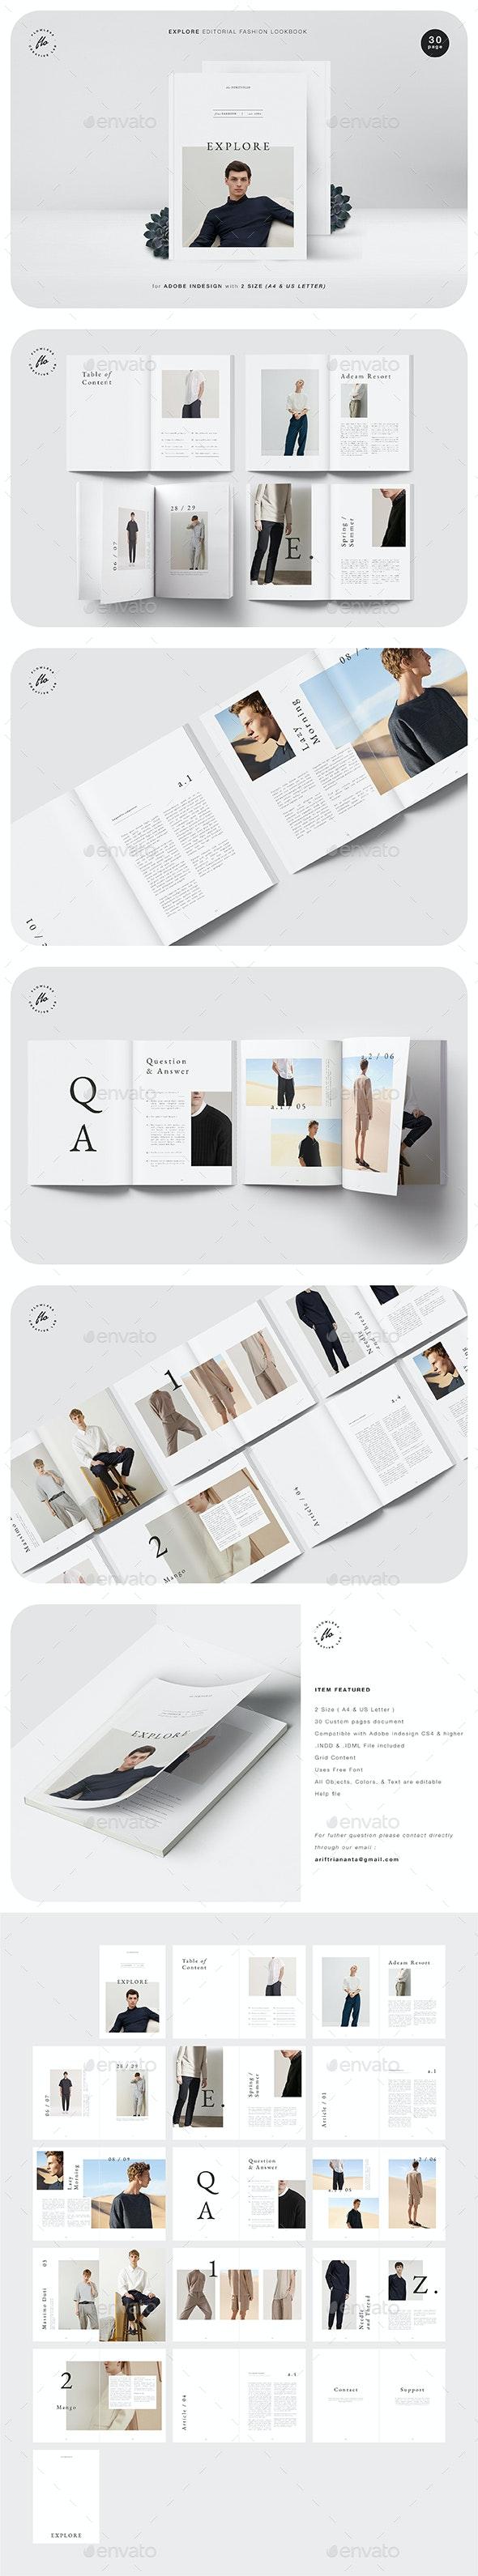 Explore Editorial Fashion Lookbook - Magazines Print Templates